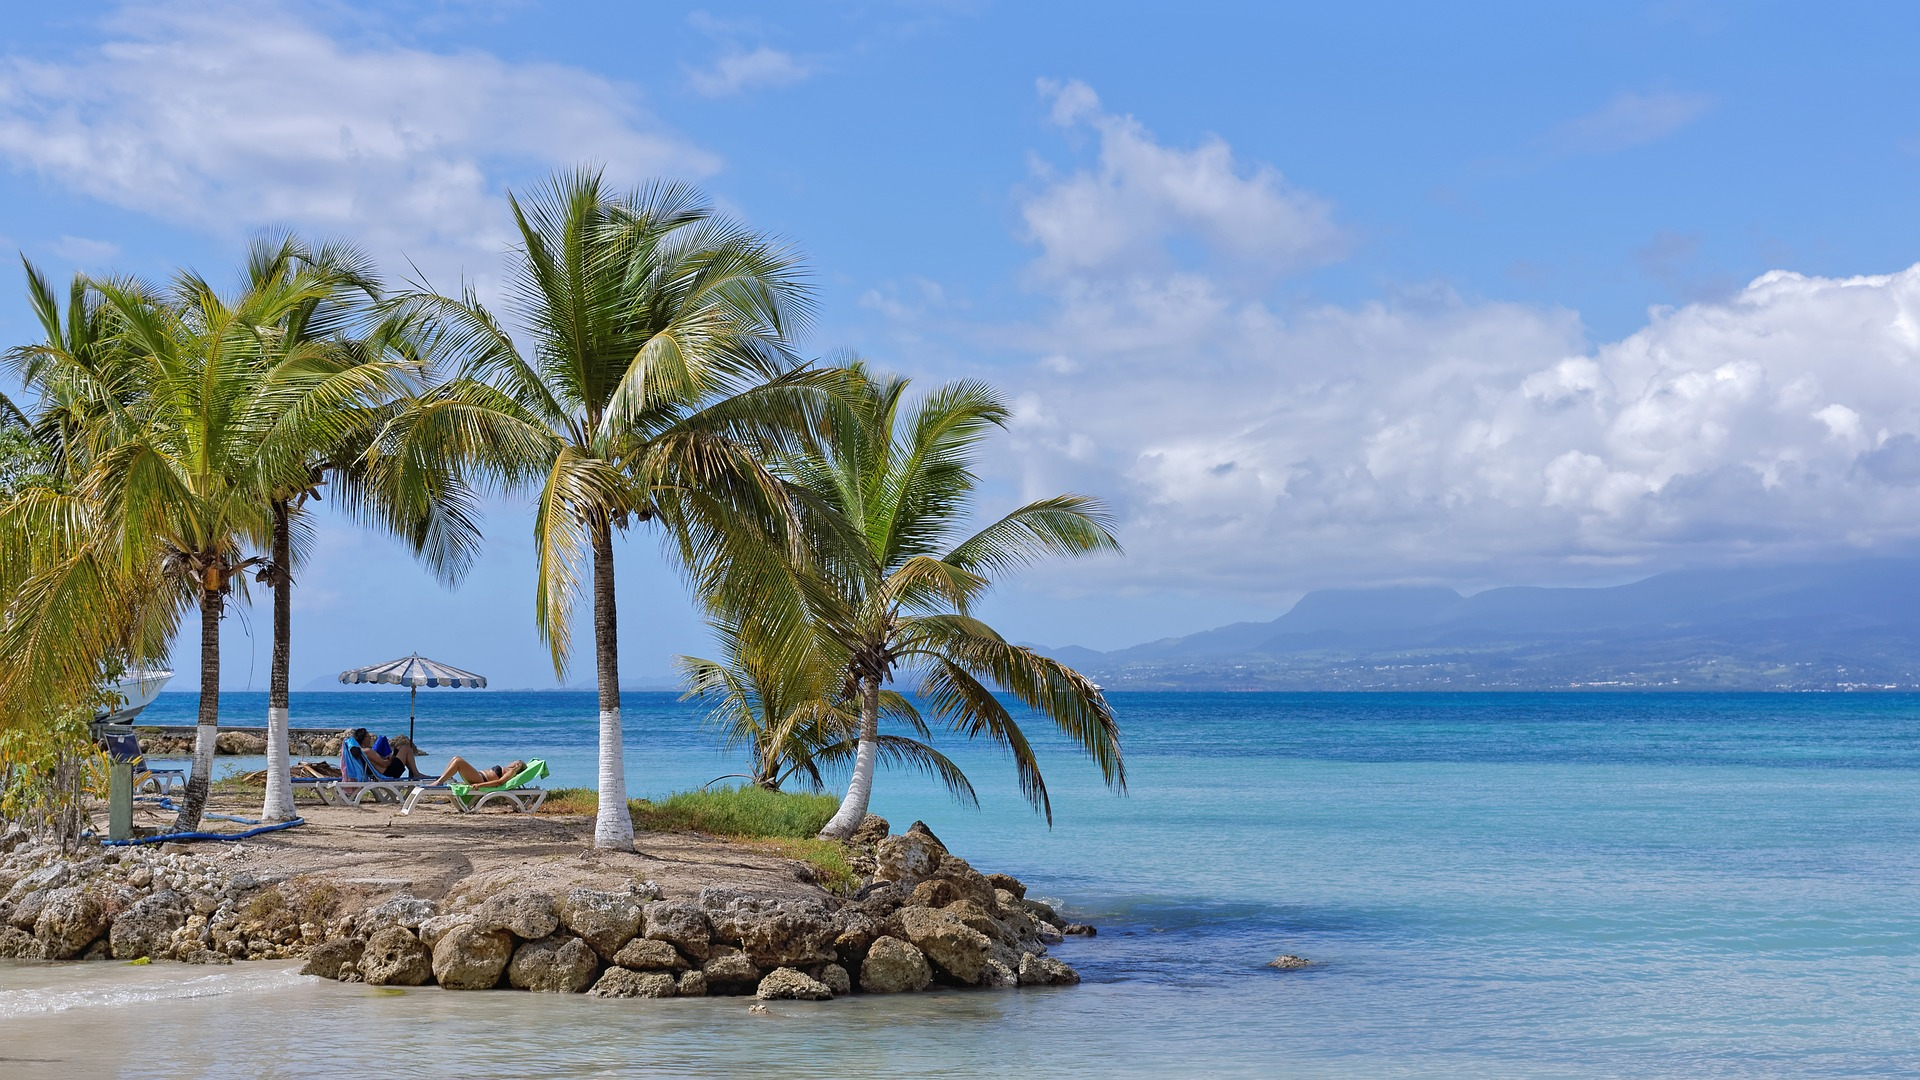 isole caraibiche francesi